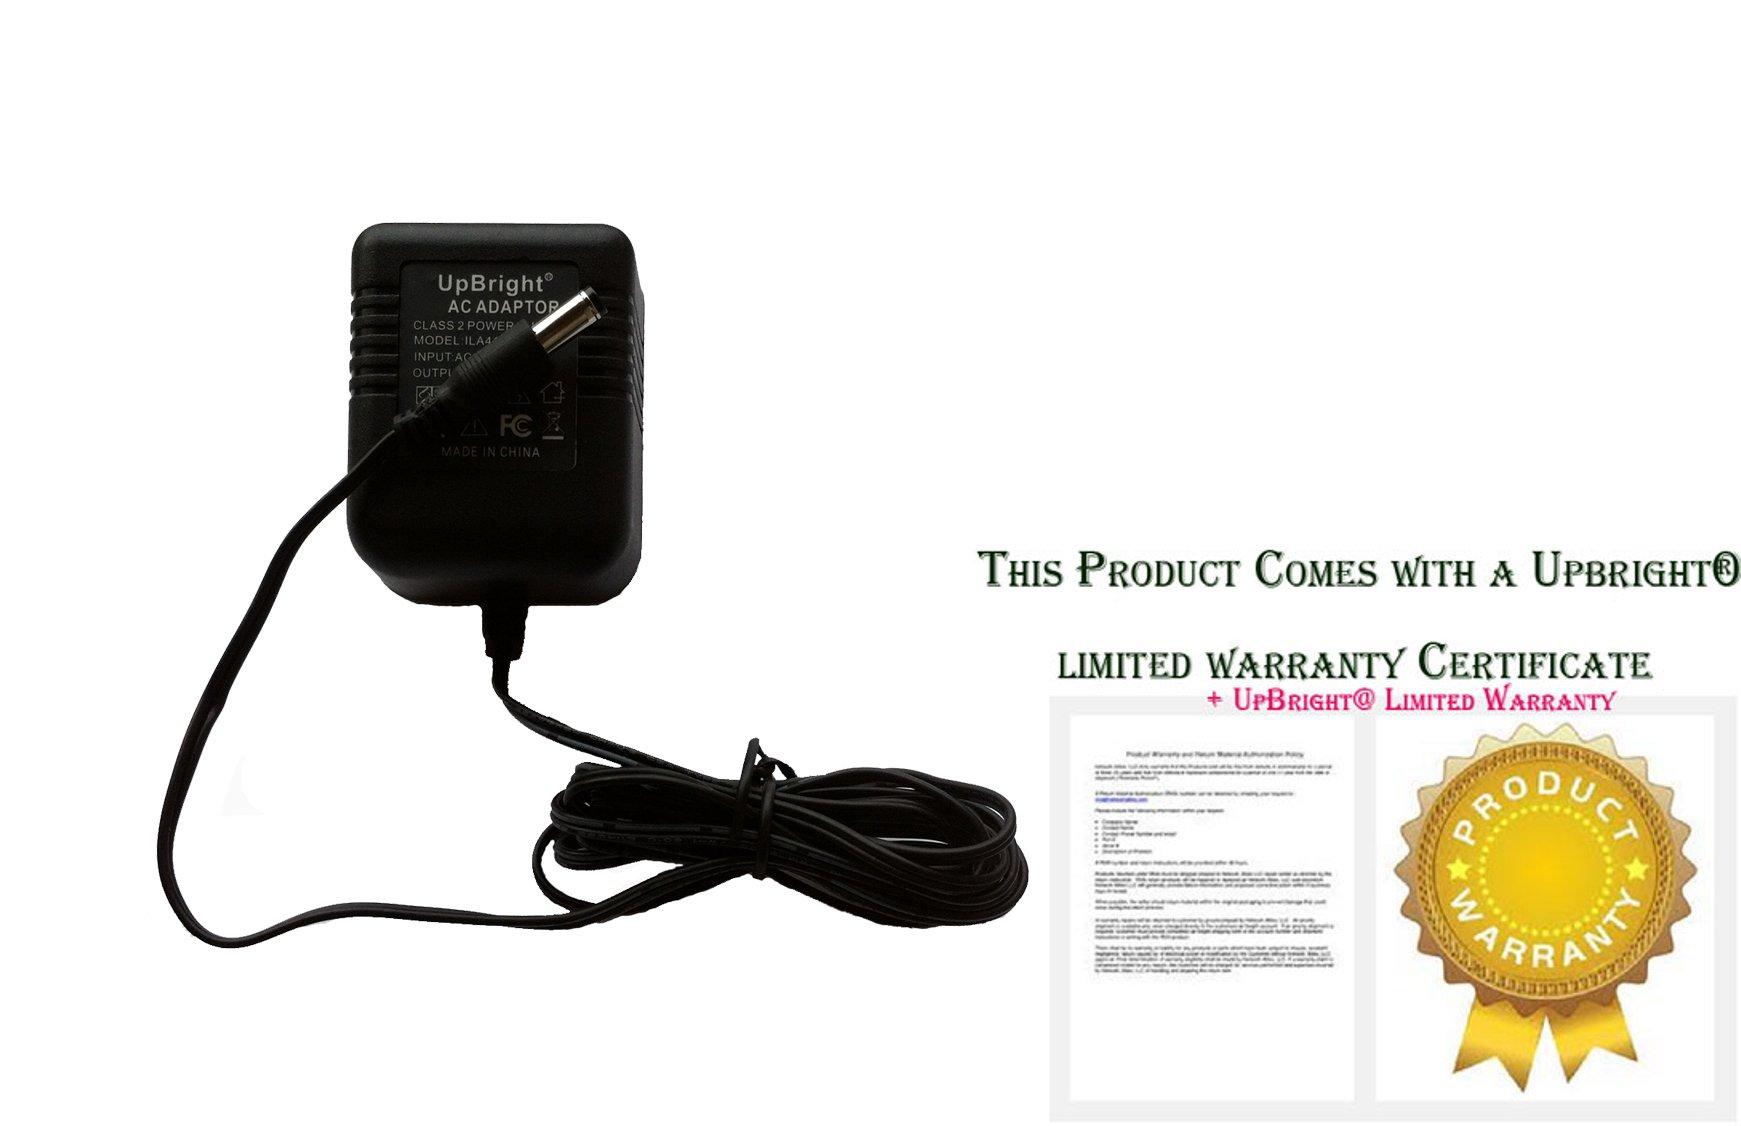 UpBright 12V AC Adapter For ZOOM GFX-4 GFX-8 RFX-1000 RFX-2000 Reverb Multi Effects GFX4 GFX8 Guitar Processor Pedal AD-0008 AD-0008D AD-1200500AU Boss Roland GR-09 ME-6 ME-6B JX-1 DS-330 Pro SE-50 by UPBRIGHT